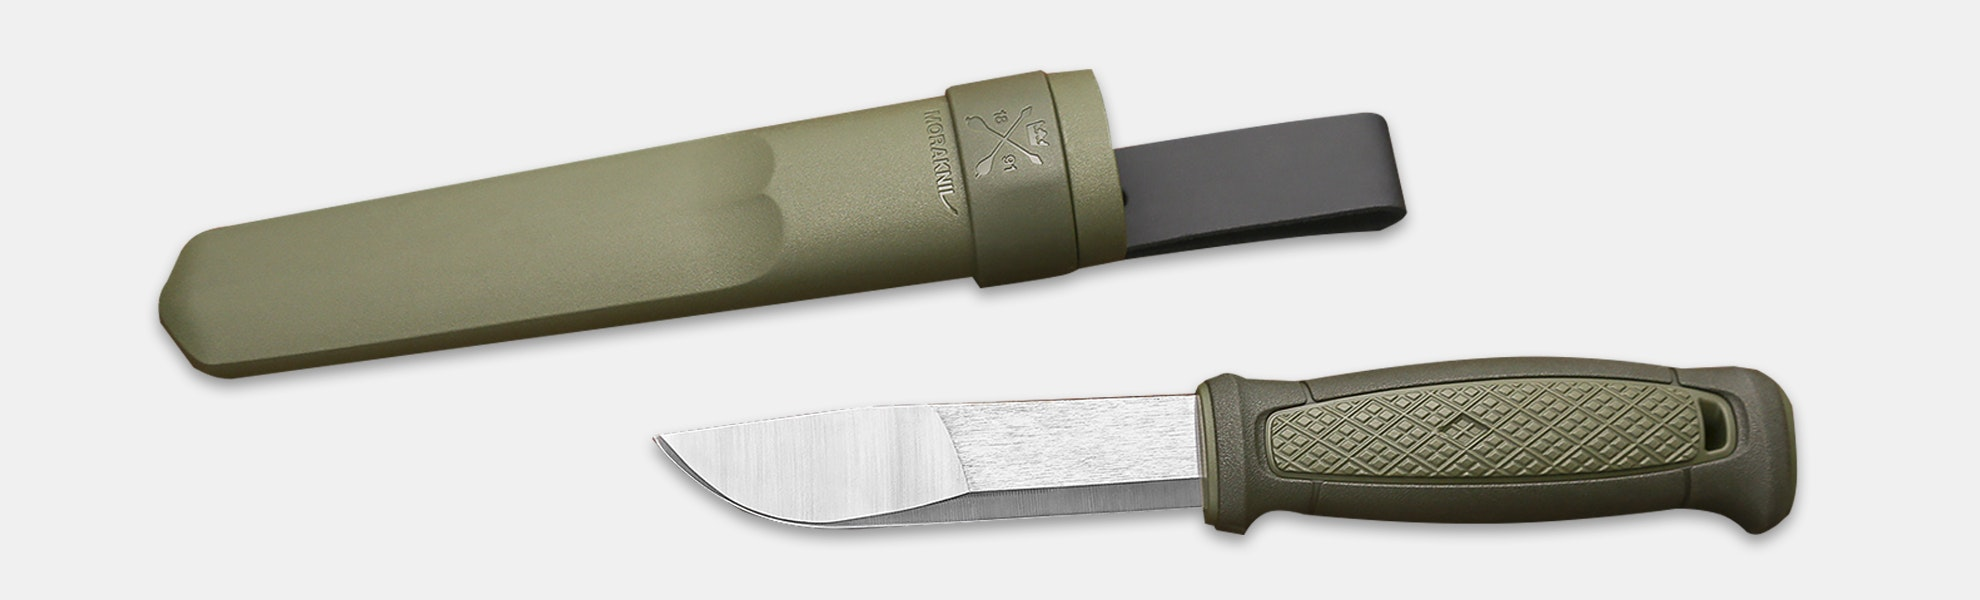 Morakniv Kansbol Knife